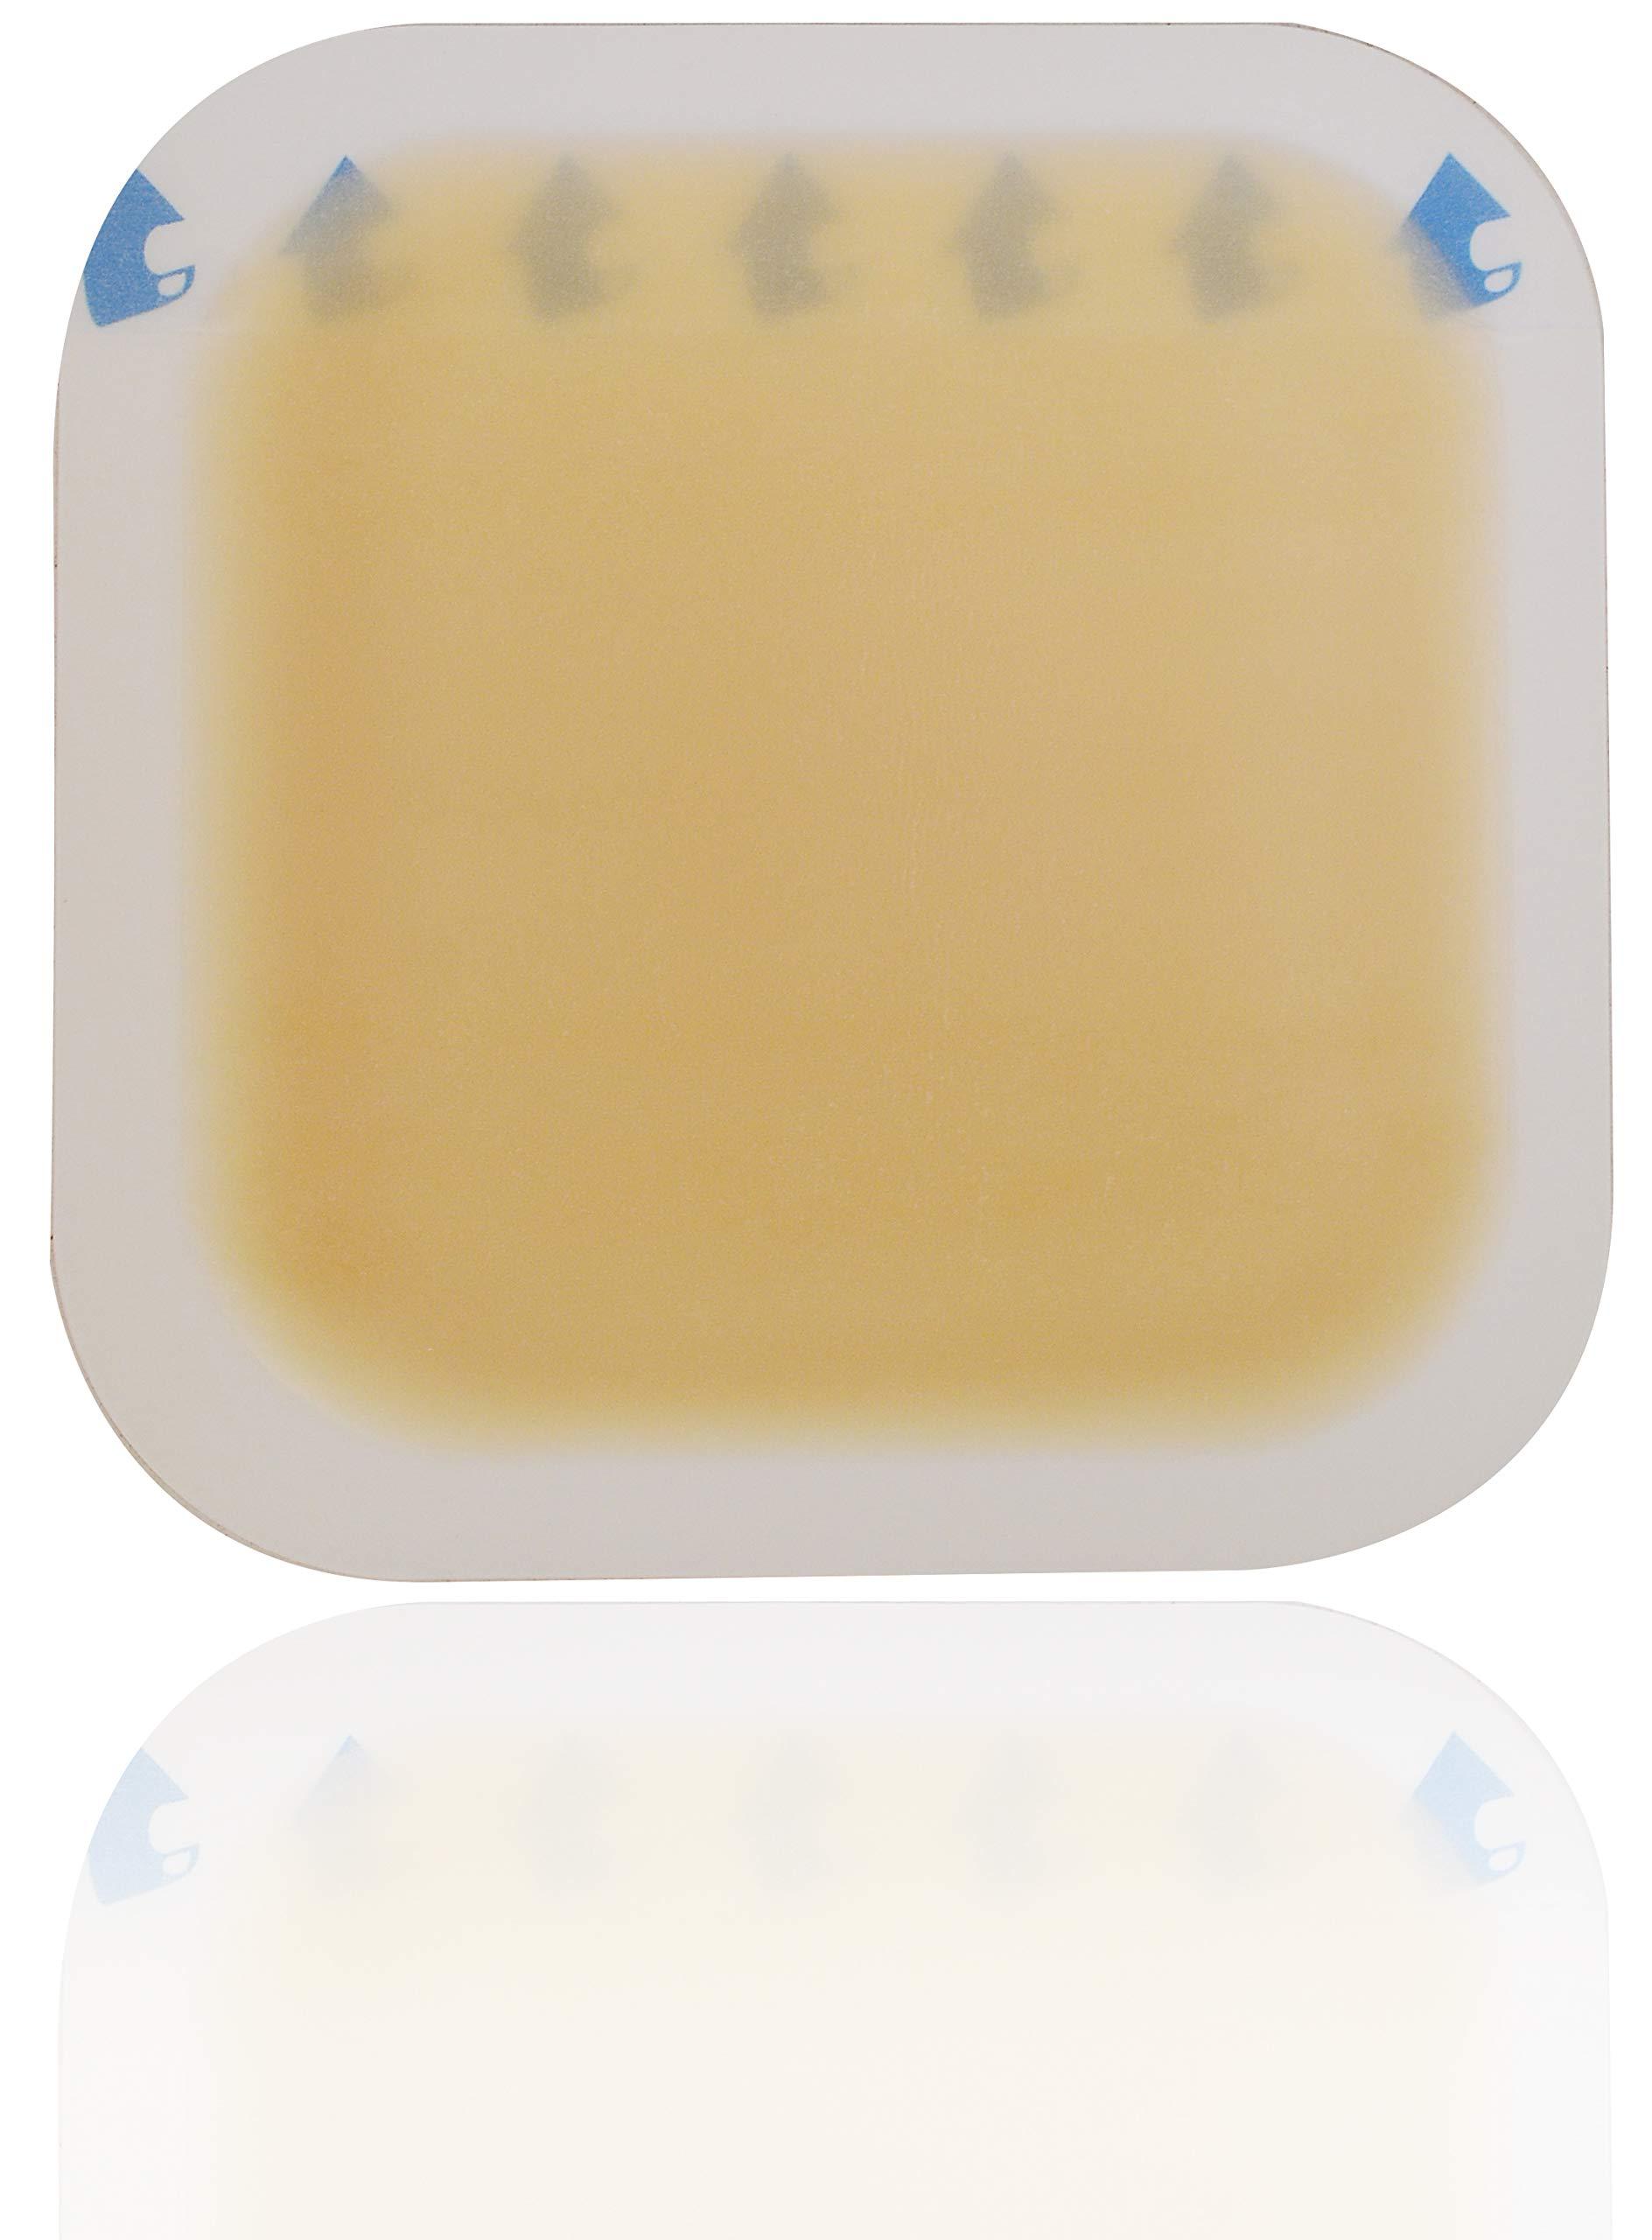 MedVance TM Hydrocolloid - Bordered Hydrocolloid Adhesive Dressing, 6''X 6'' Box of 5 DRESSINGS